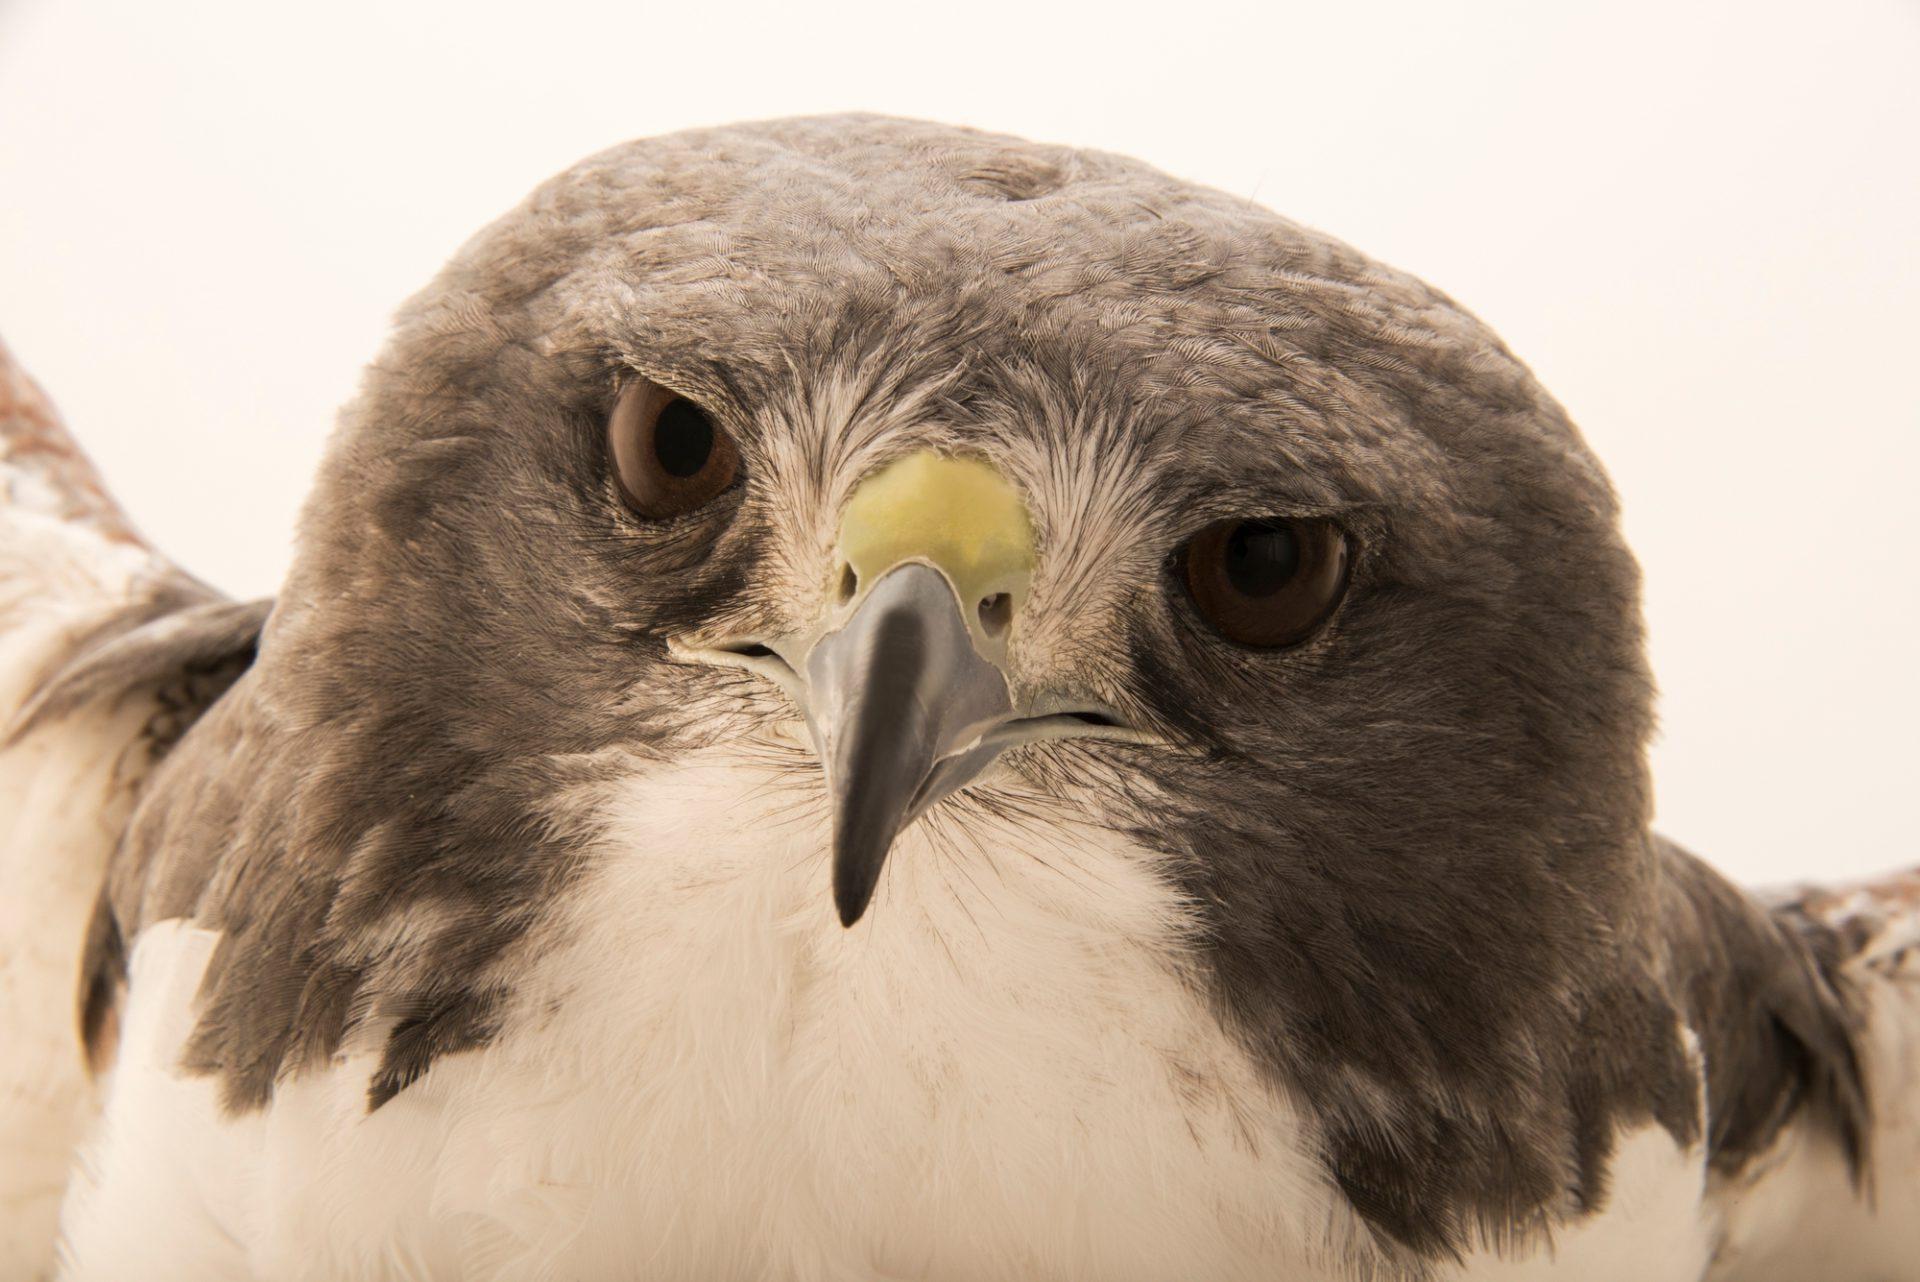 Photo: A white-tailed hawk (Geranoaetus albicaudatus hypospodius) at SIA, the Comanche Nation Ethno-Ornithological Initiative.